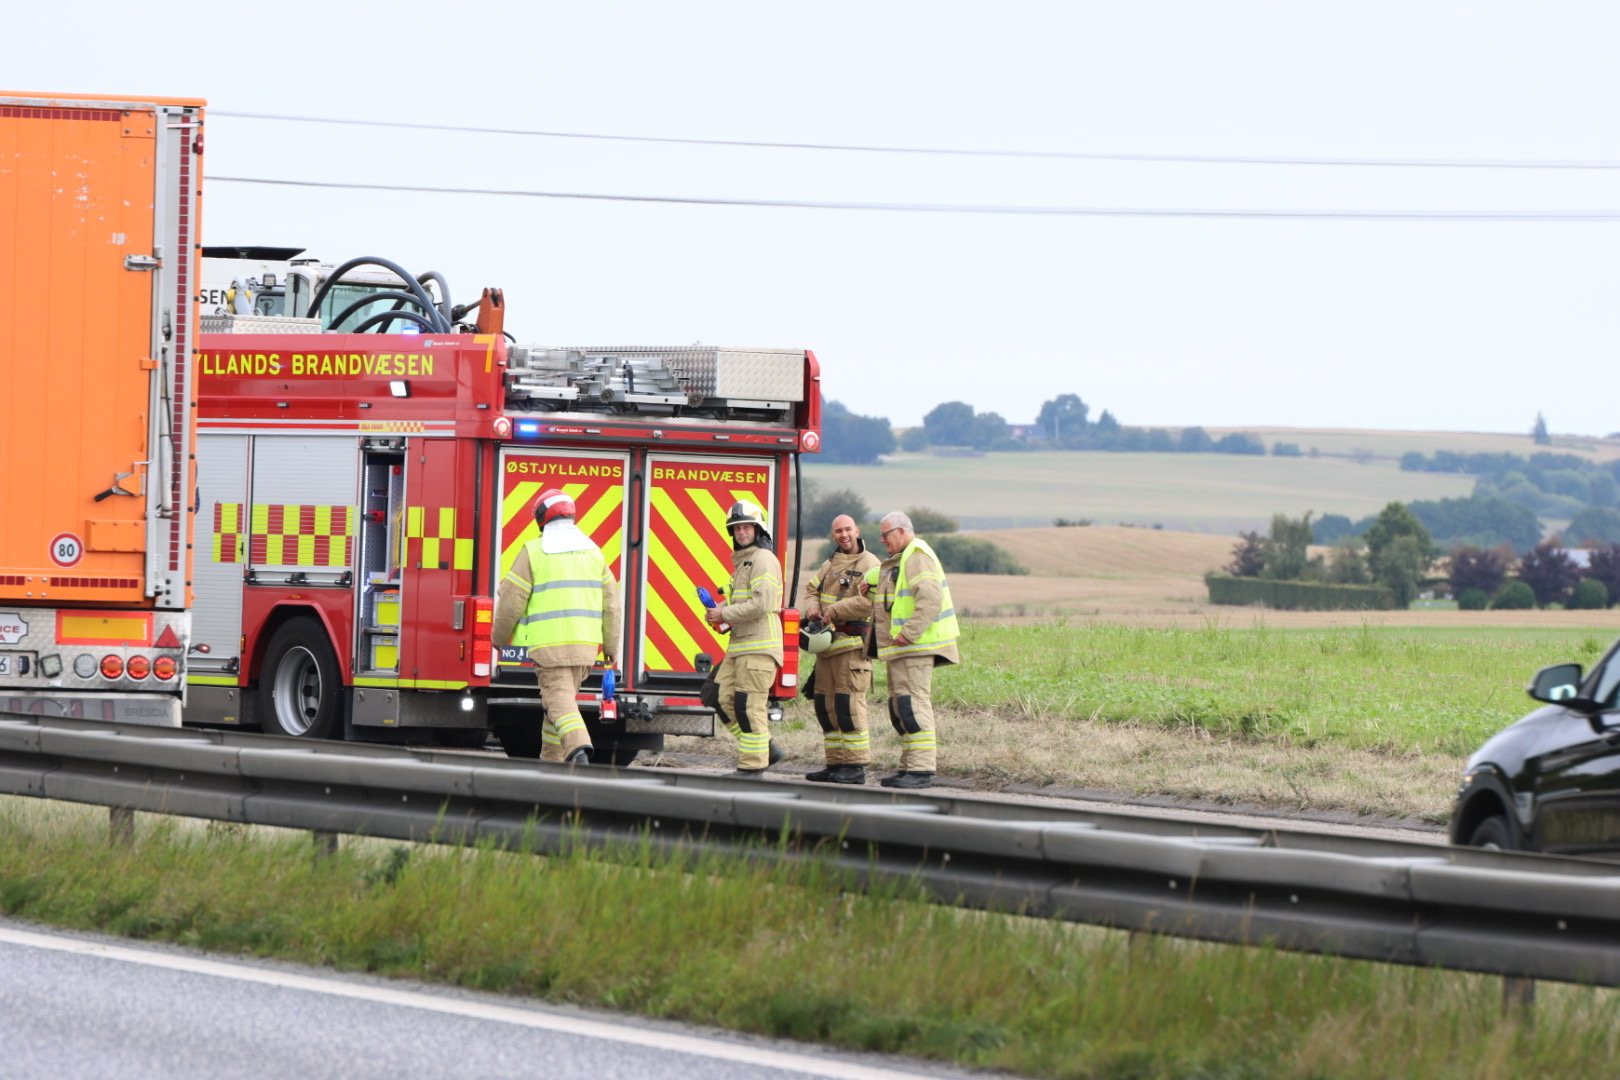 Ild i lastbil skaber større kø på motorvej